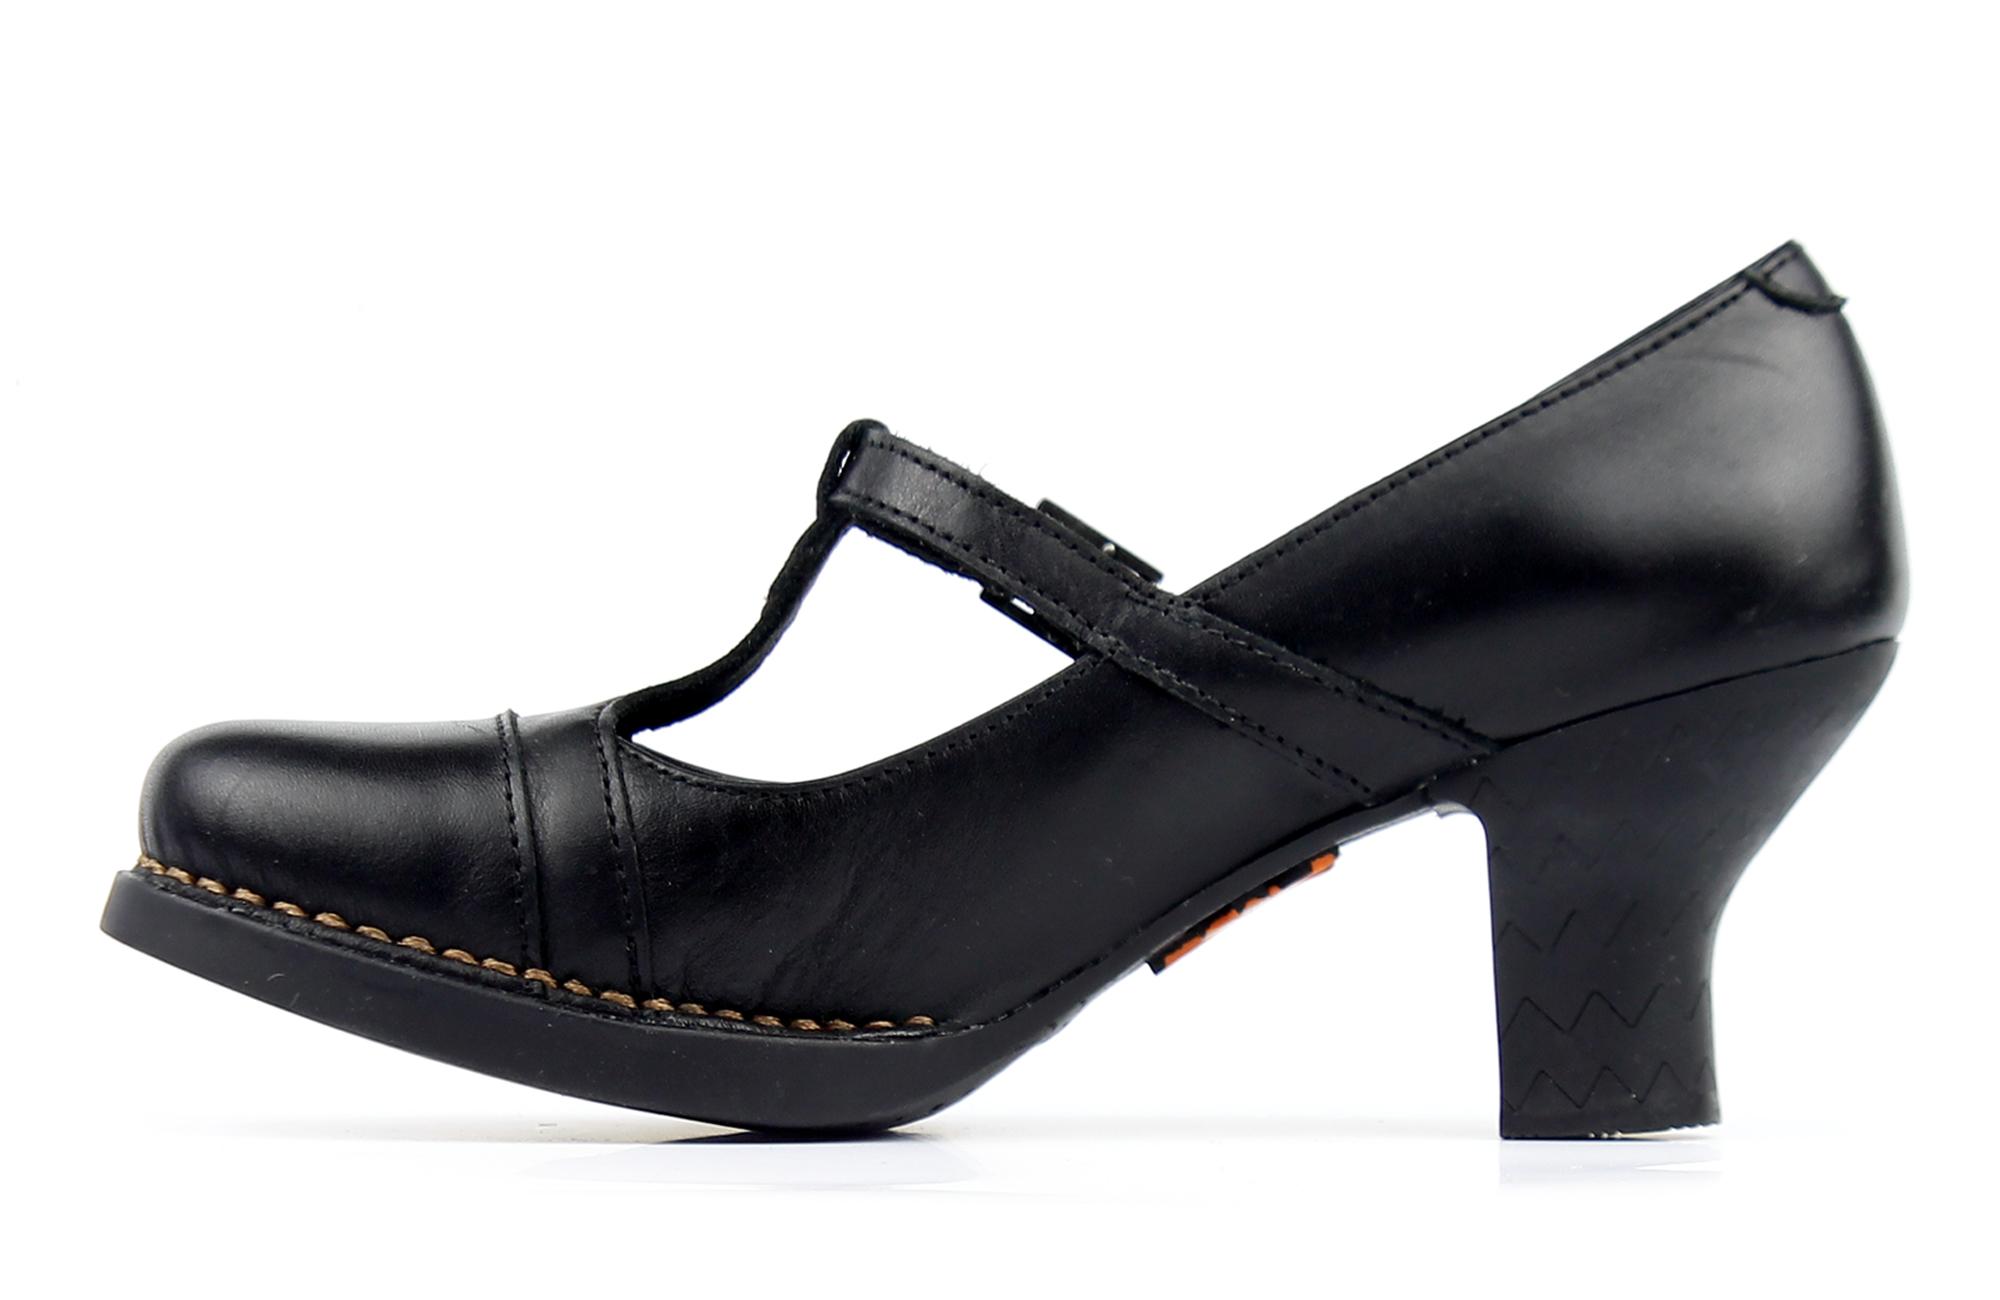 Art Harlem Black, Schuhe, Absatzschuhe, Pumps, Schwarz, Female, 37